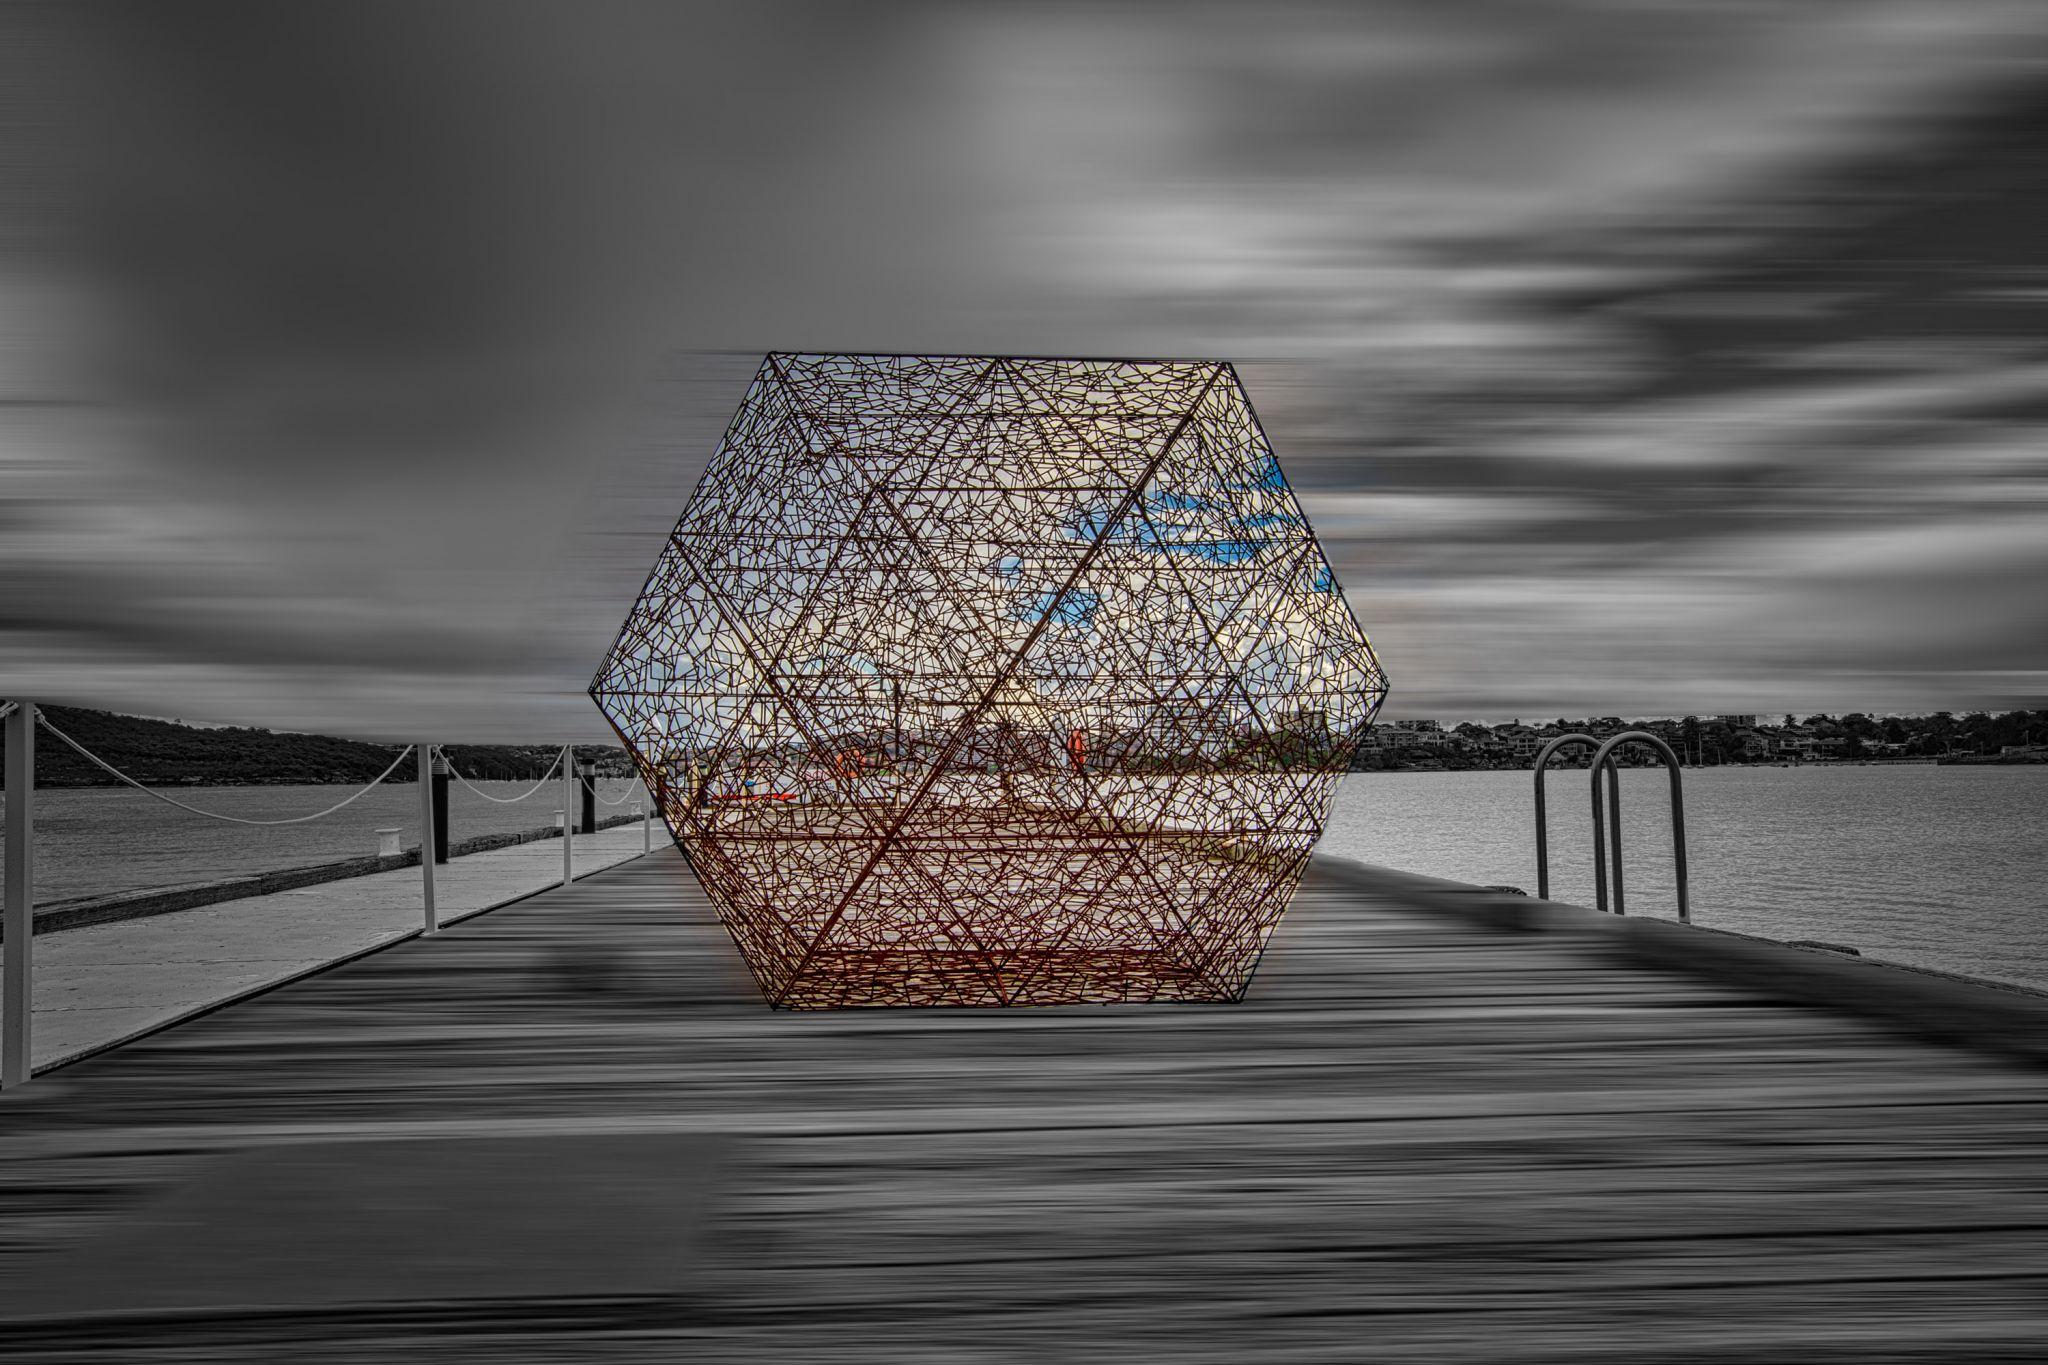 Mesh object on the Wharf, North Head, Sydney, Australia